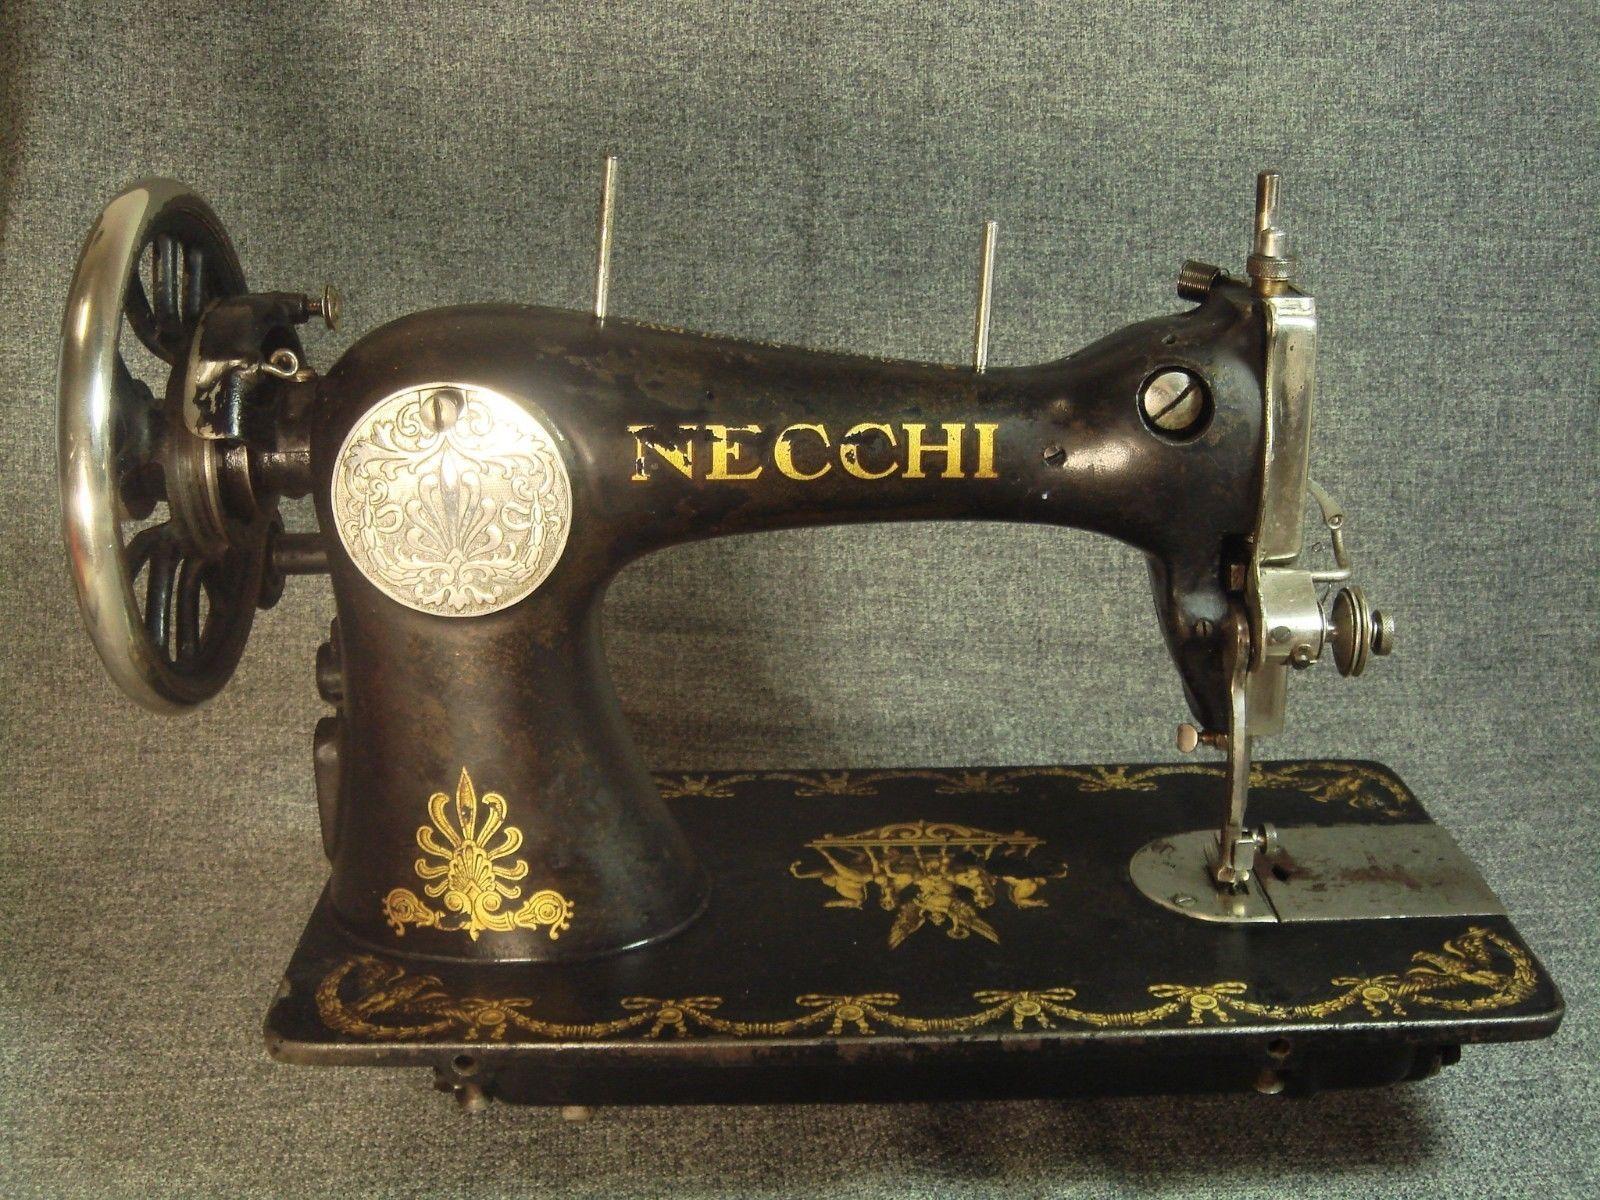 Old Antique Italian Sewing Machine 76726 Vittorio Necchi Pavia Italia 5525   eBay